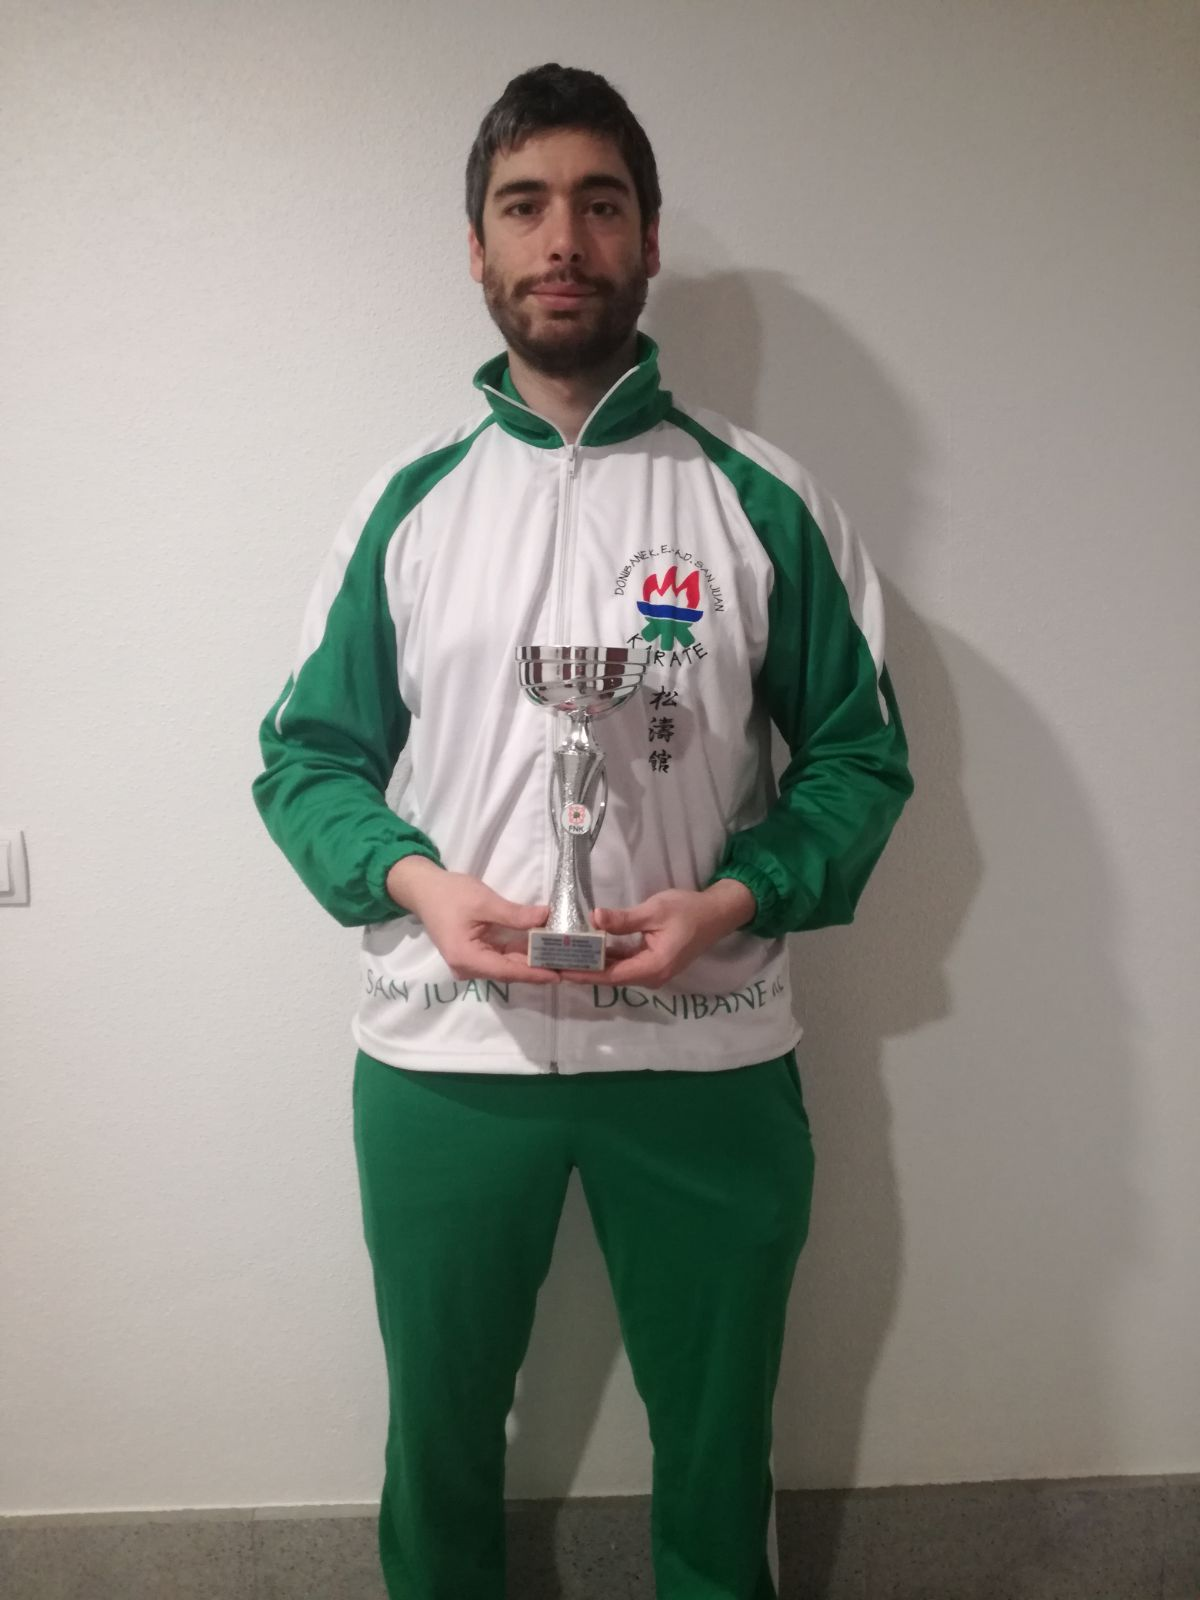 Rubén Arrastio tercero en Kumite del Cto. Navarro de Karate